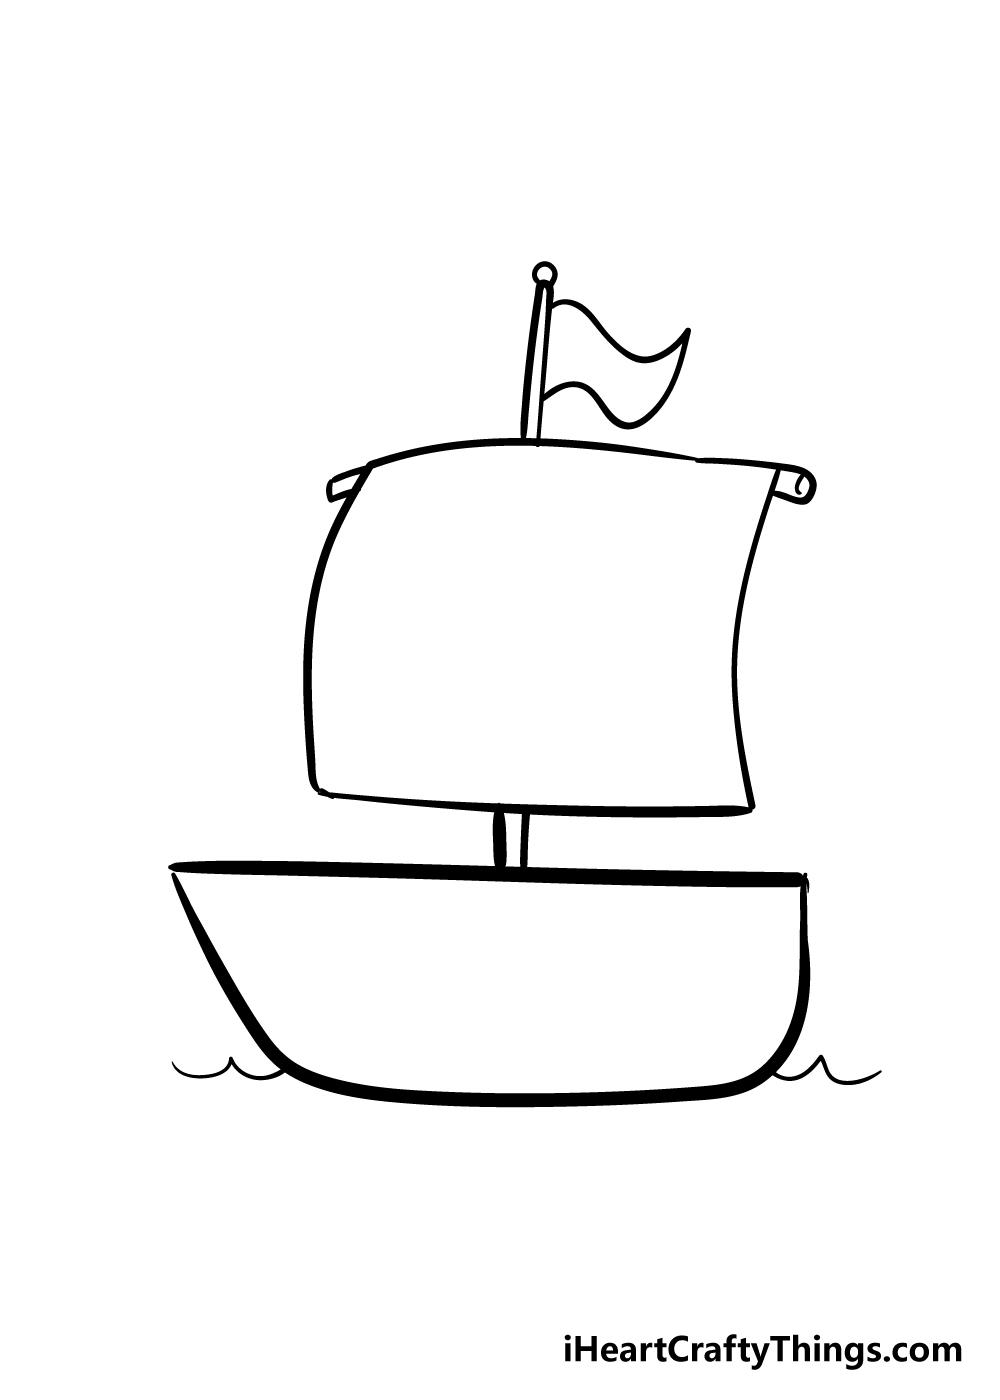 boat drawing step 5